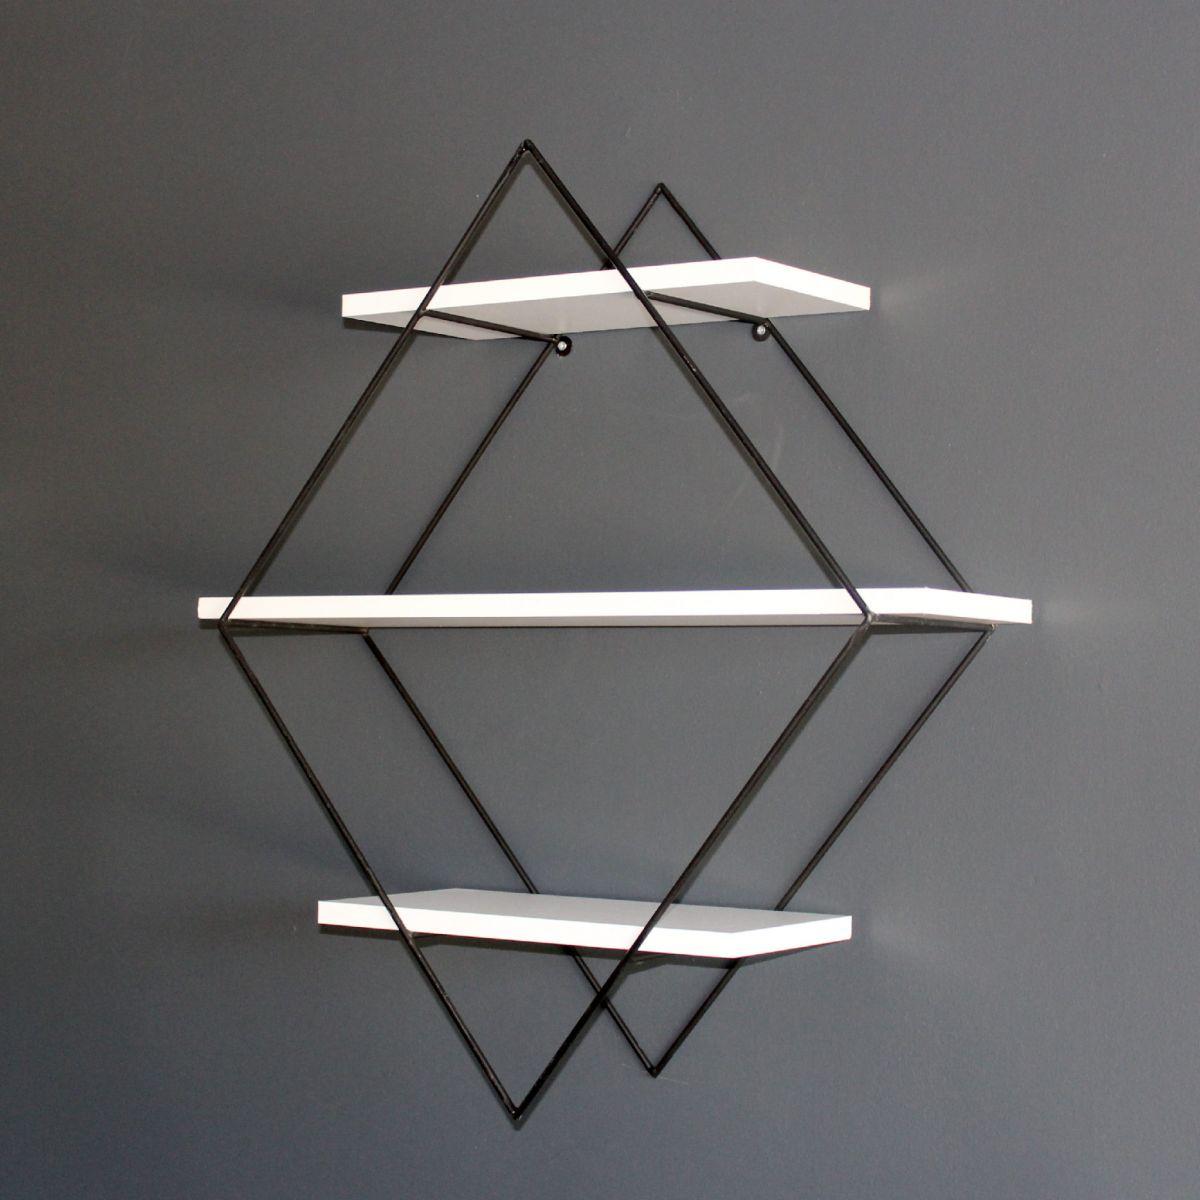 Raft de perete din PAL/metal, Prisma Homs, alb/negru, 41.5 x 21 cm